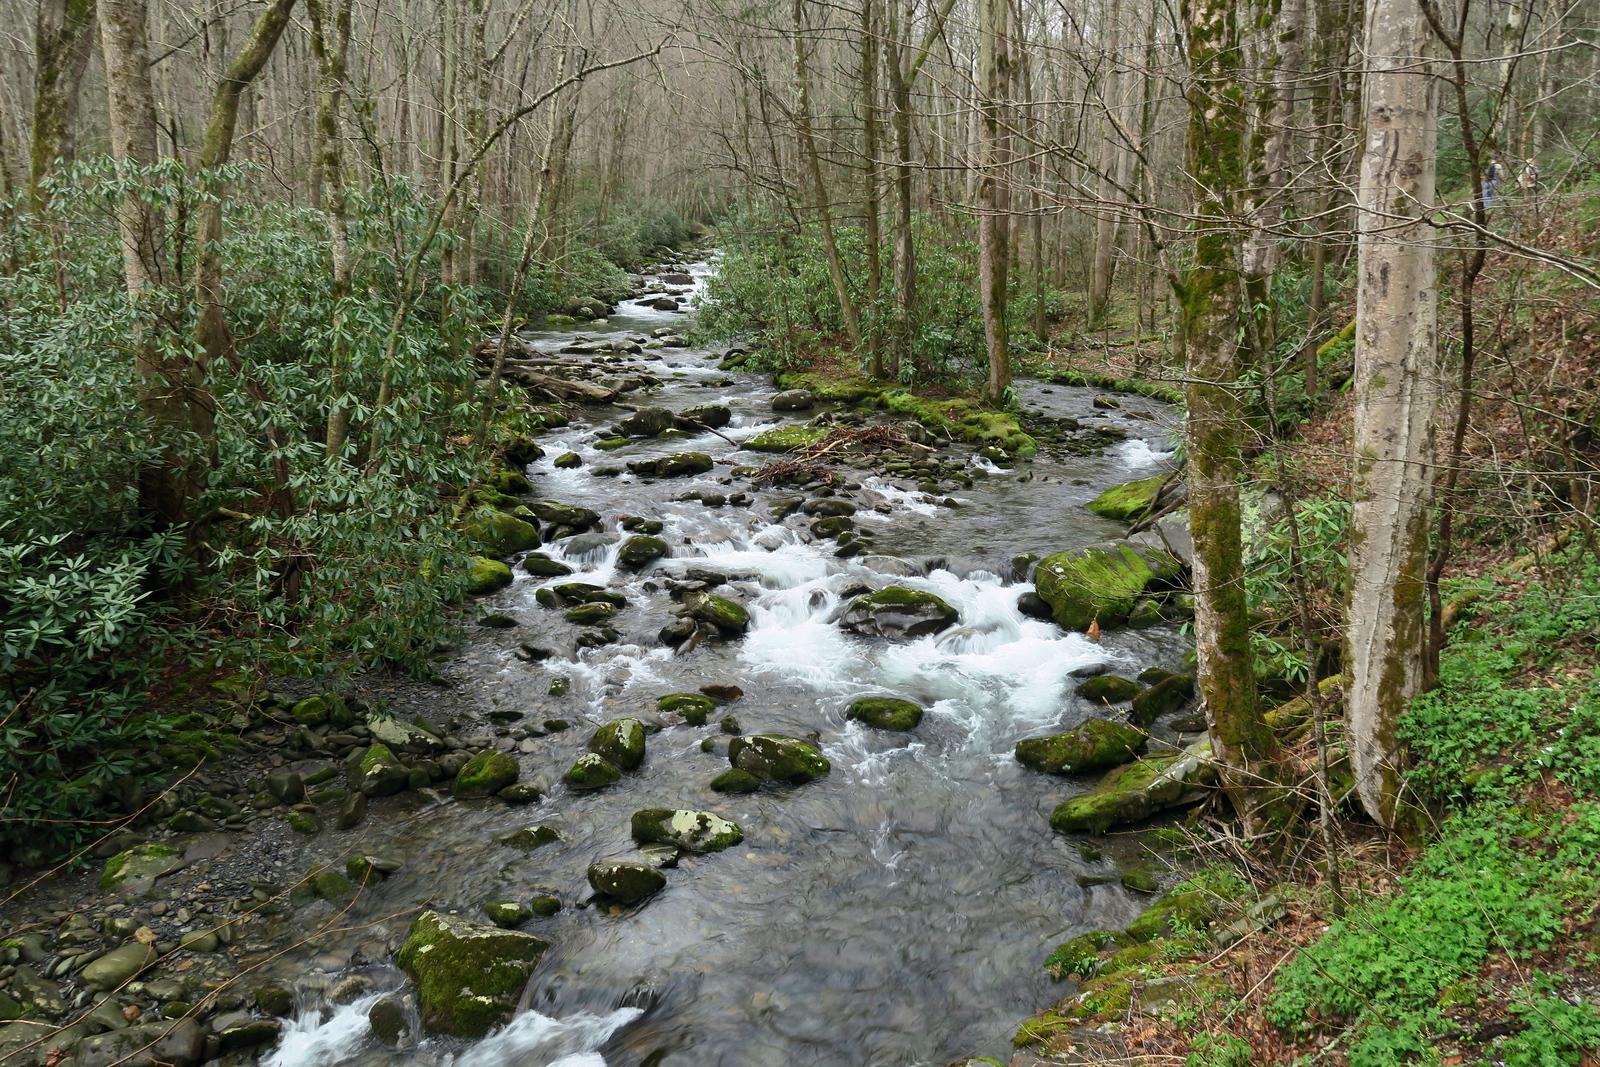 Porter's Creek